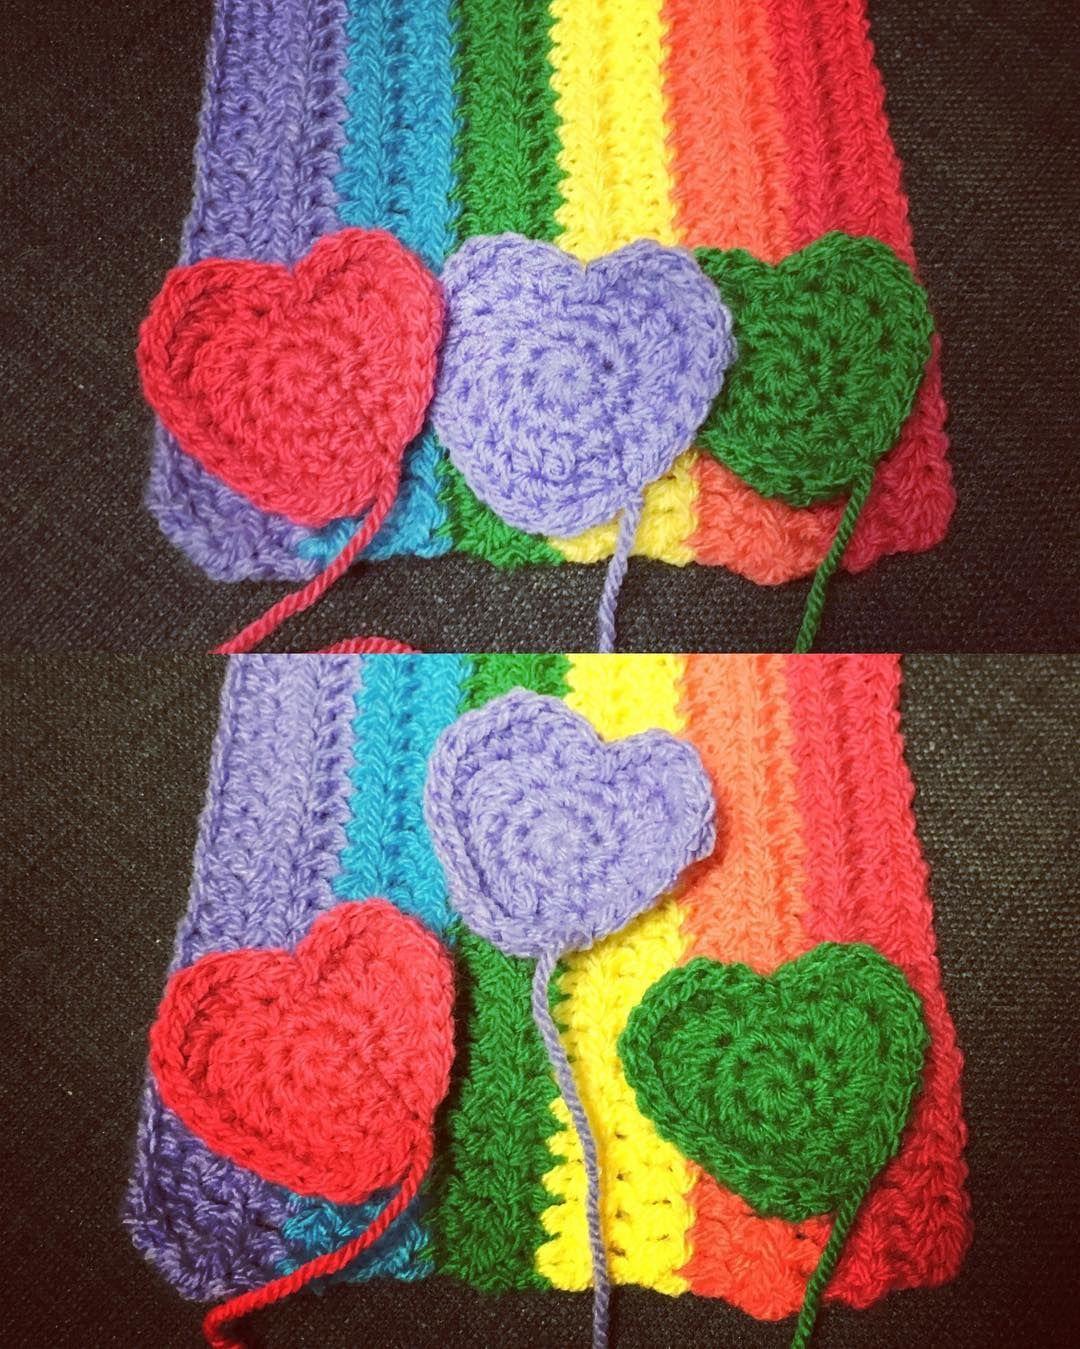 wrappedwithlovebymichelle Brains trust I need your help! Which heart arrangement do you think looks best on the ends of this scarf - top or bottom?? #heart #rainbow #regenbogen #scarf #help #crochet #häkeln #hekel #ganchillo #crochetersofinstagram #crochetcommunity #crochetbetweenworlds #crochetconcupiscence #craftastherapy